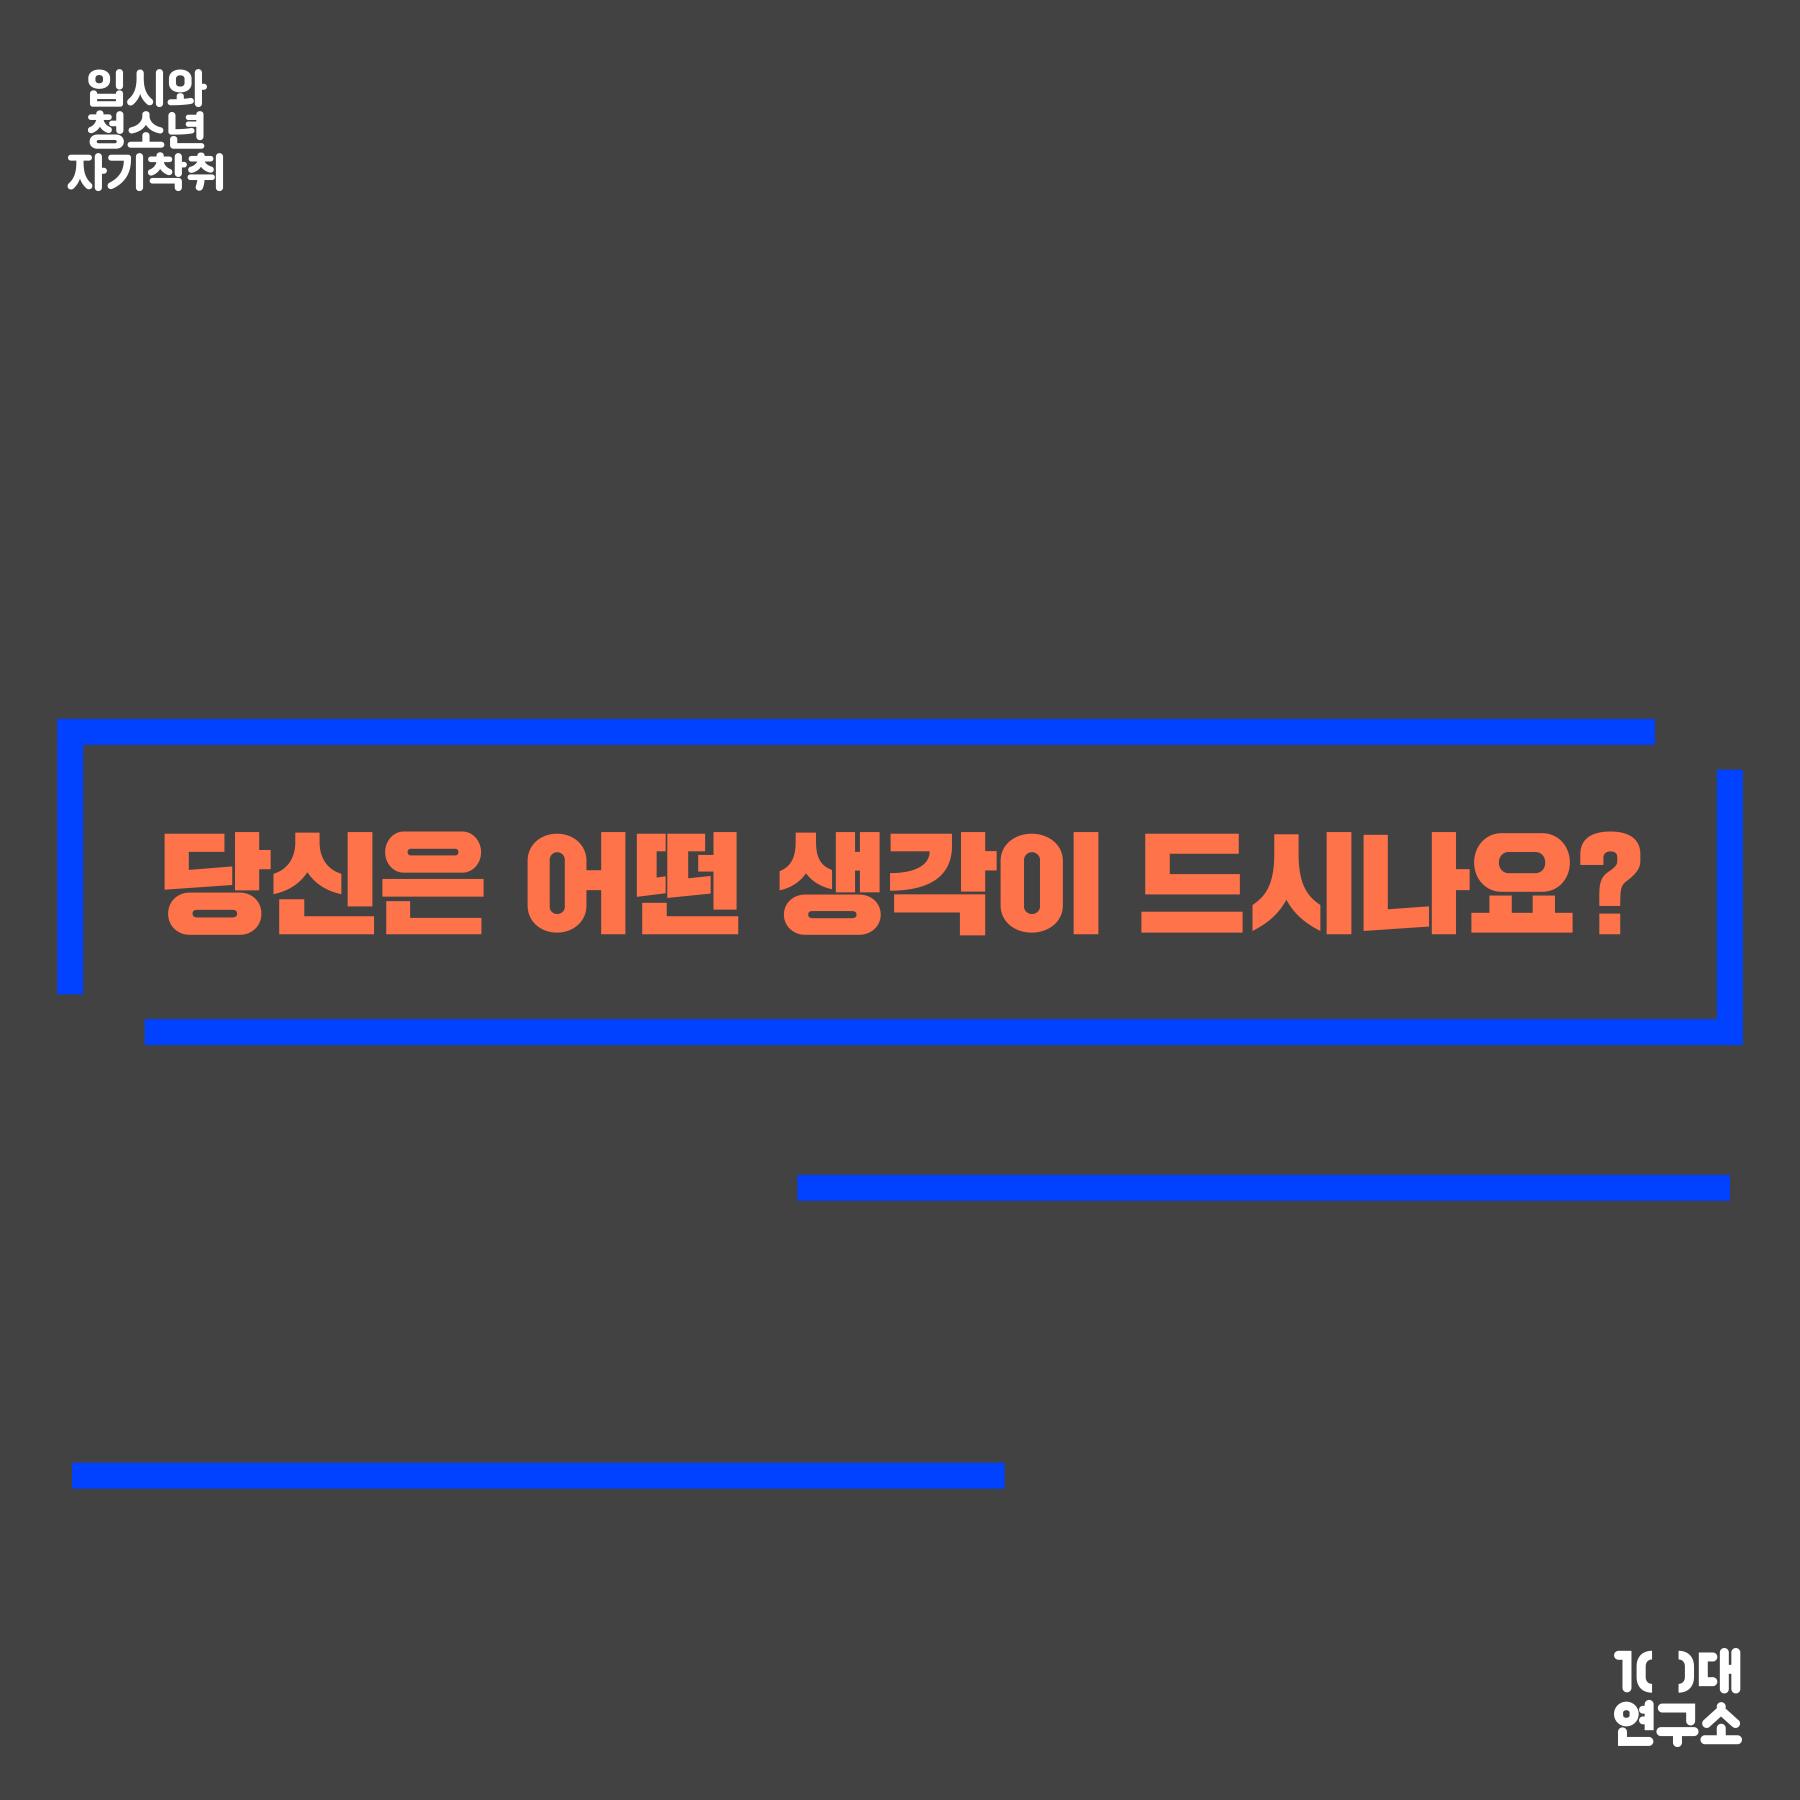 A_입시와 청소년 자기착취_19.png